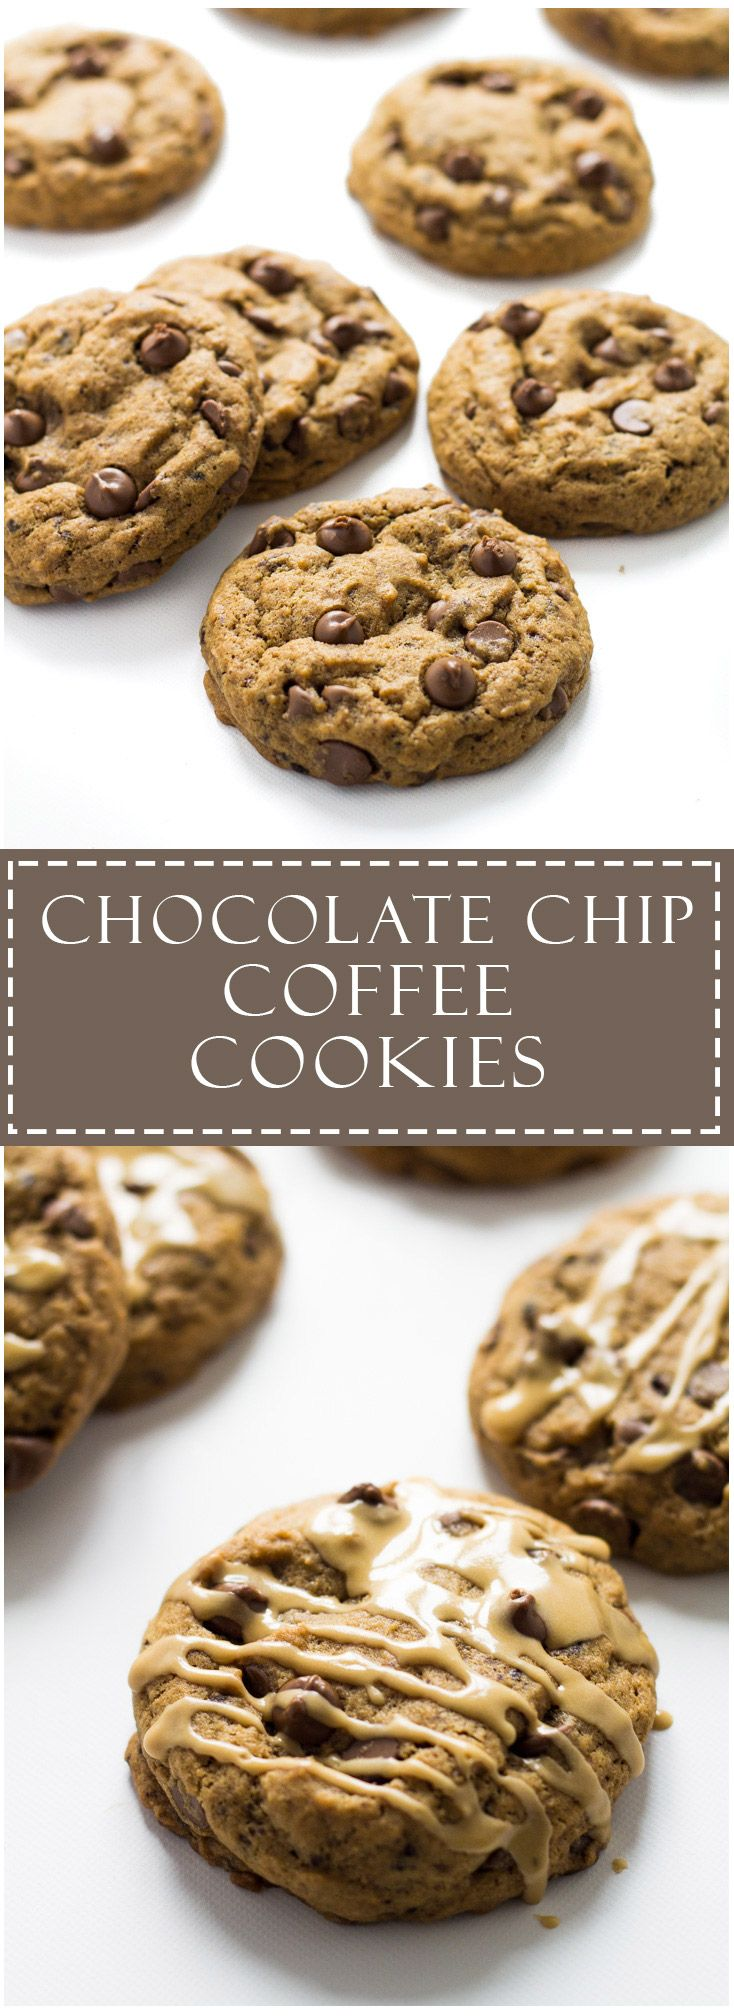 Chocolate Chip Coffee Cookies   Marsha's Baking Addiction